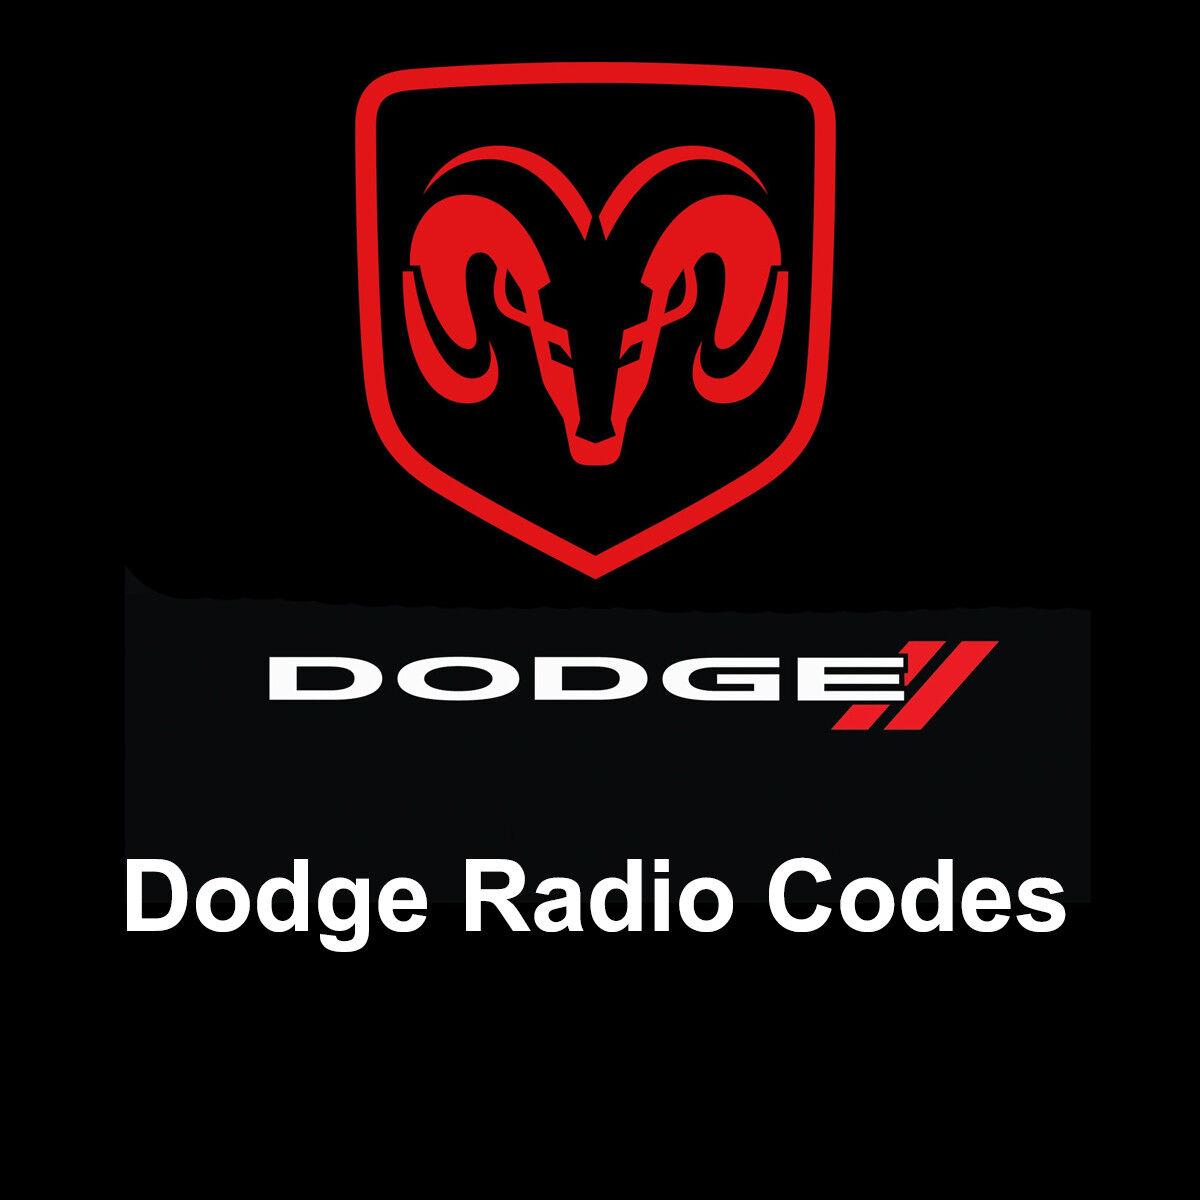 Details about Dodge Radio Code Anti Theft Stereo Unlock Codes Fast Service  Ram/Sprinter